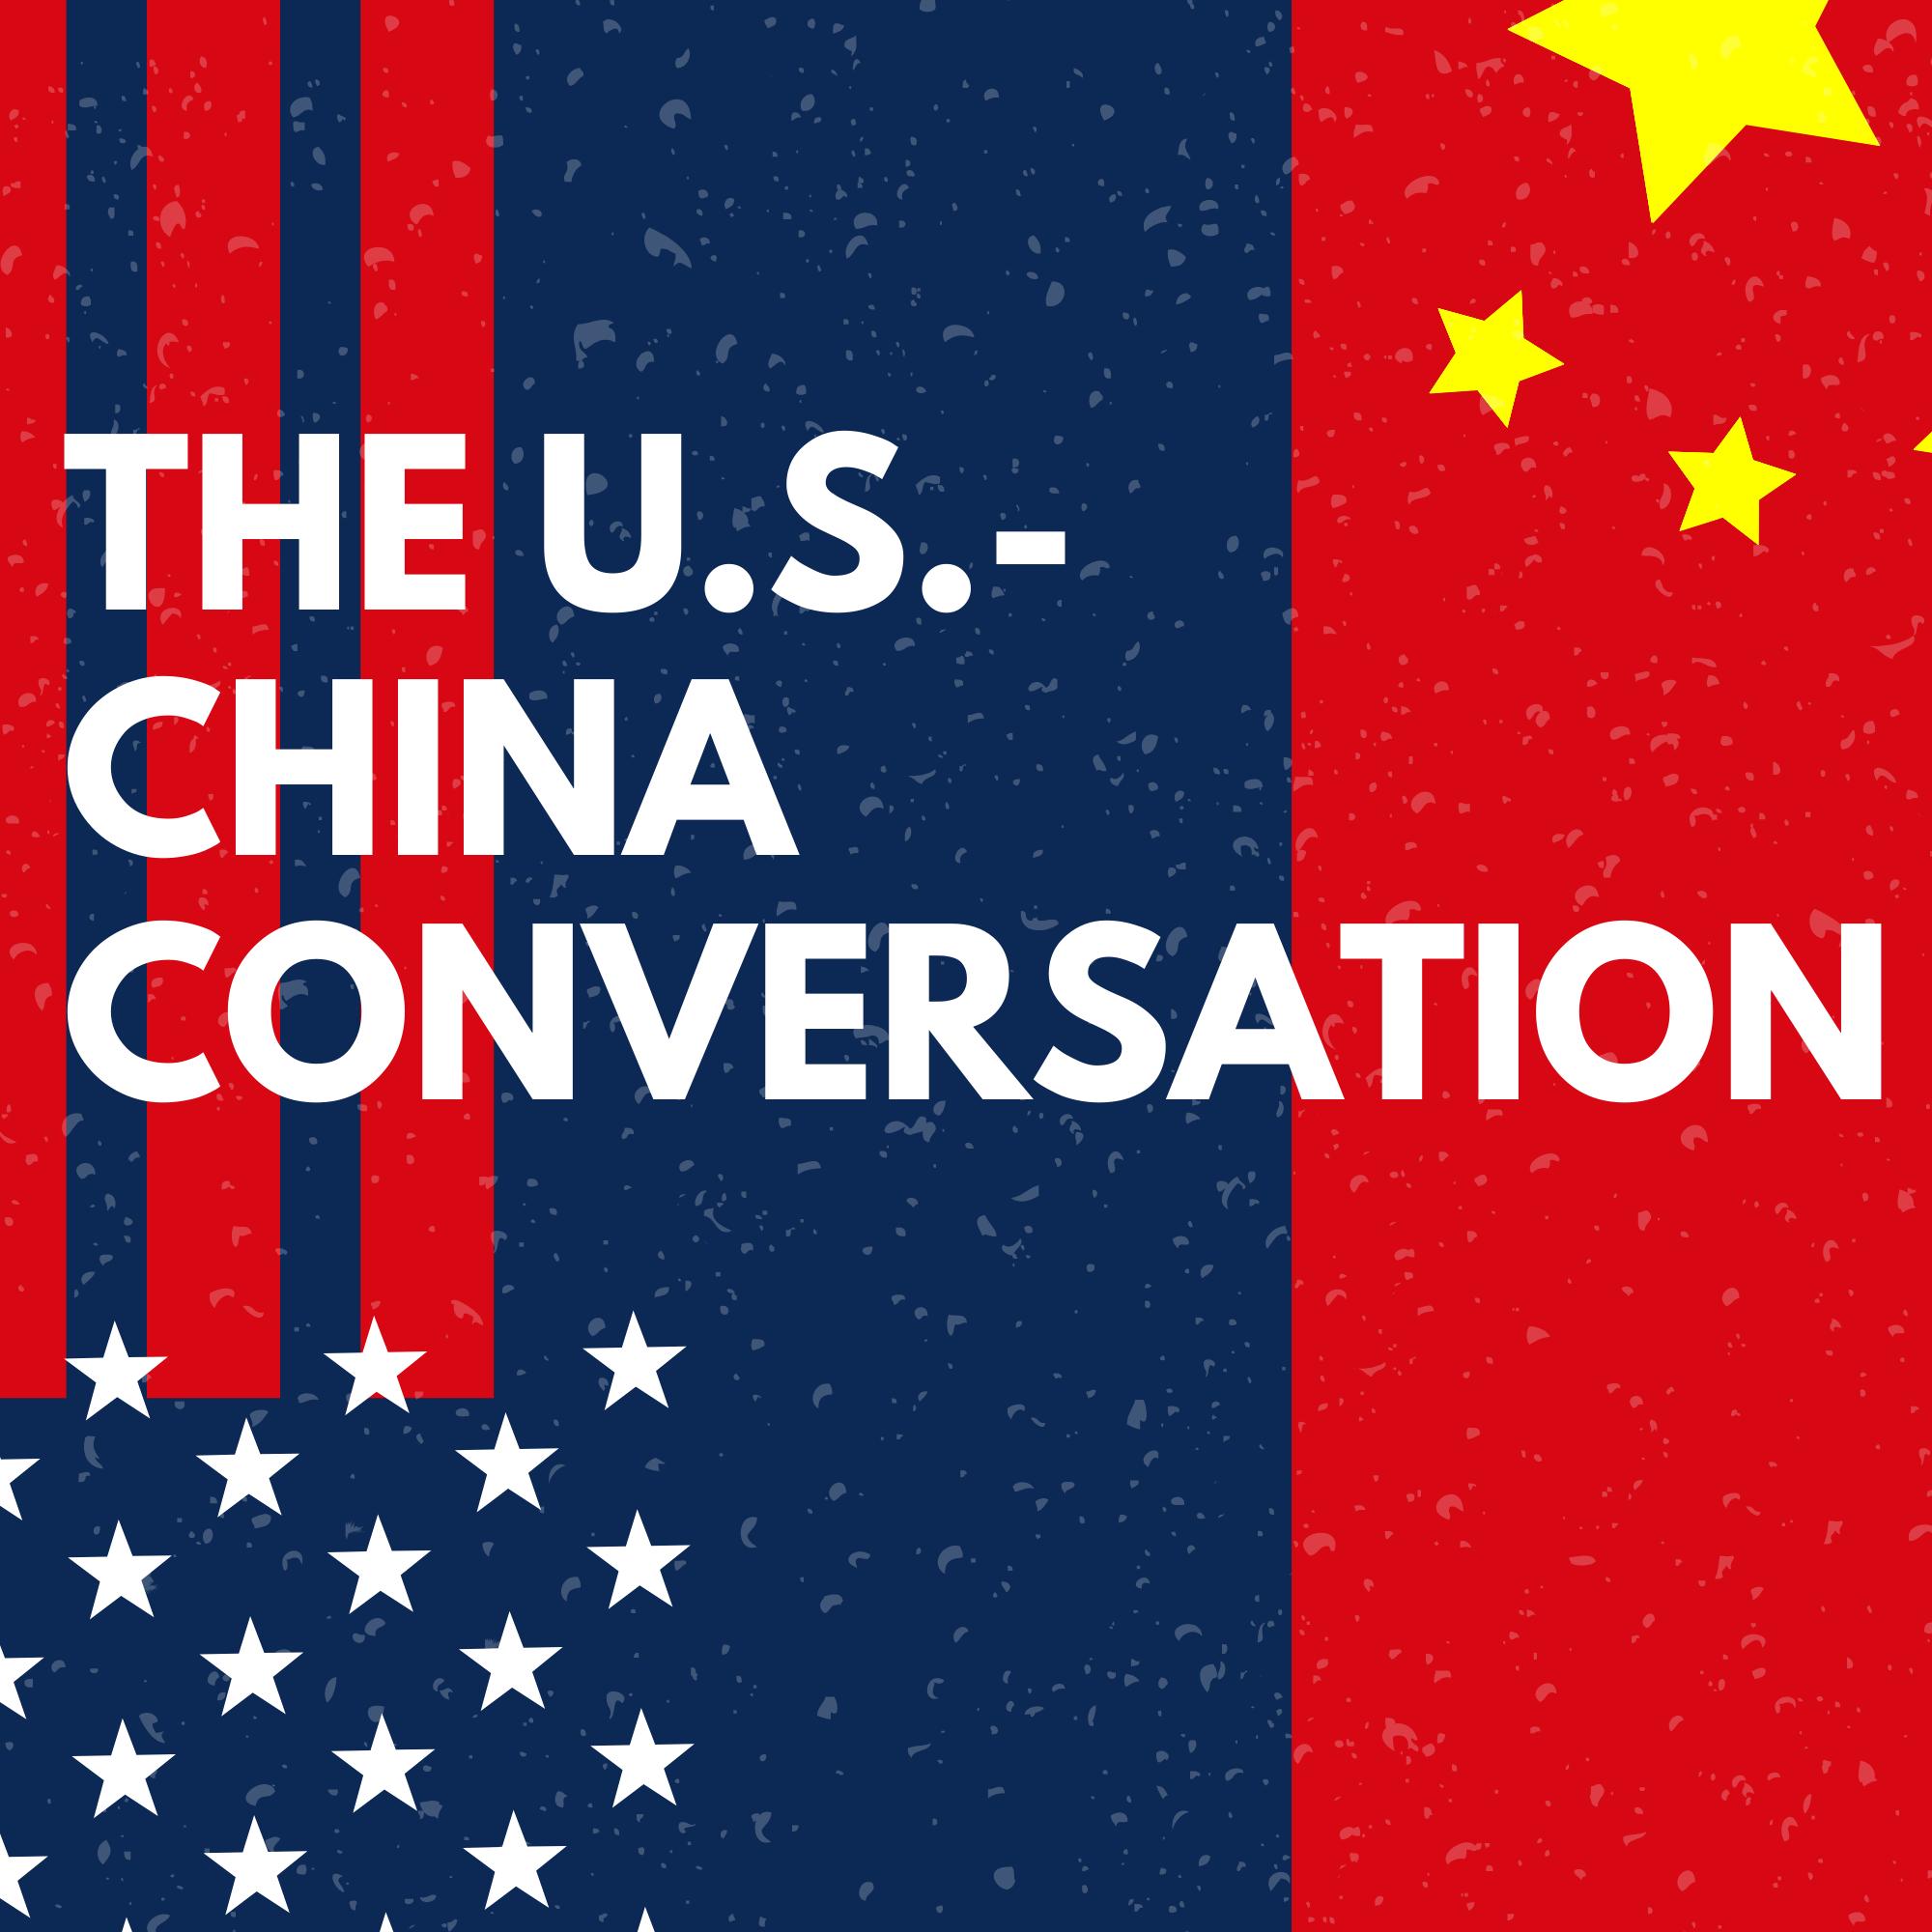 Artwork for podcast The U.S. - China Conversation